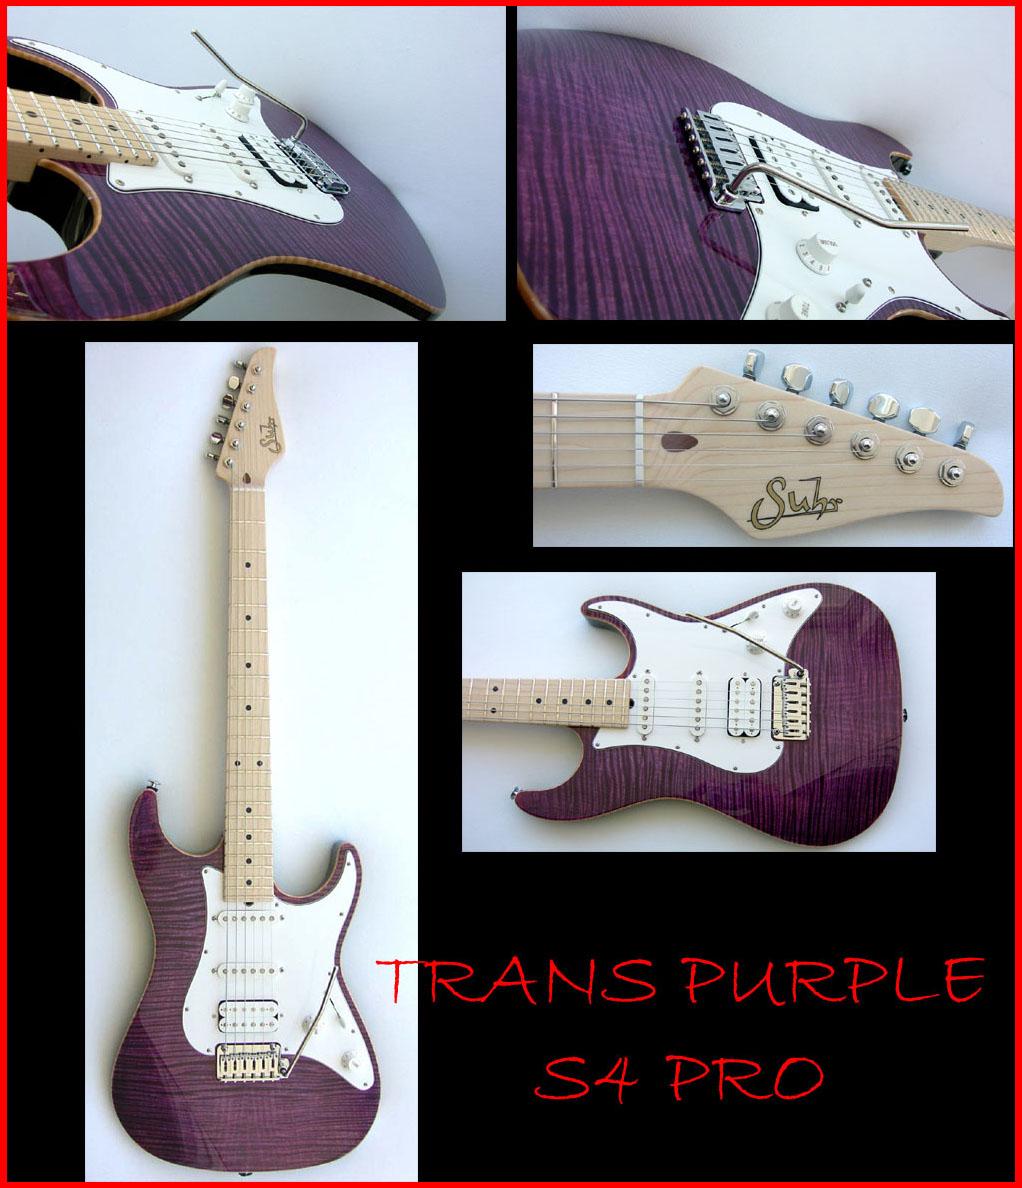 John Suhr Custom Guitar Trans Purple S4